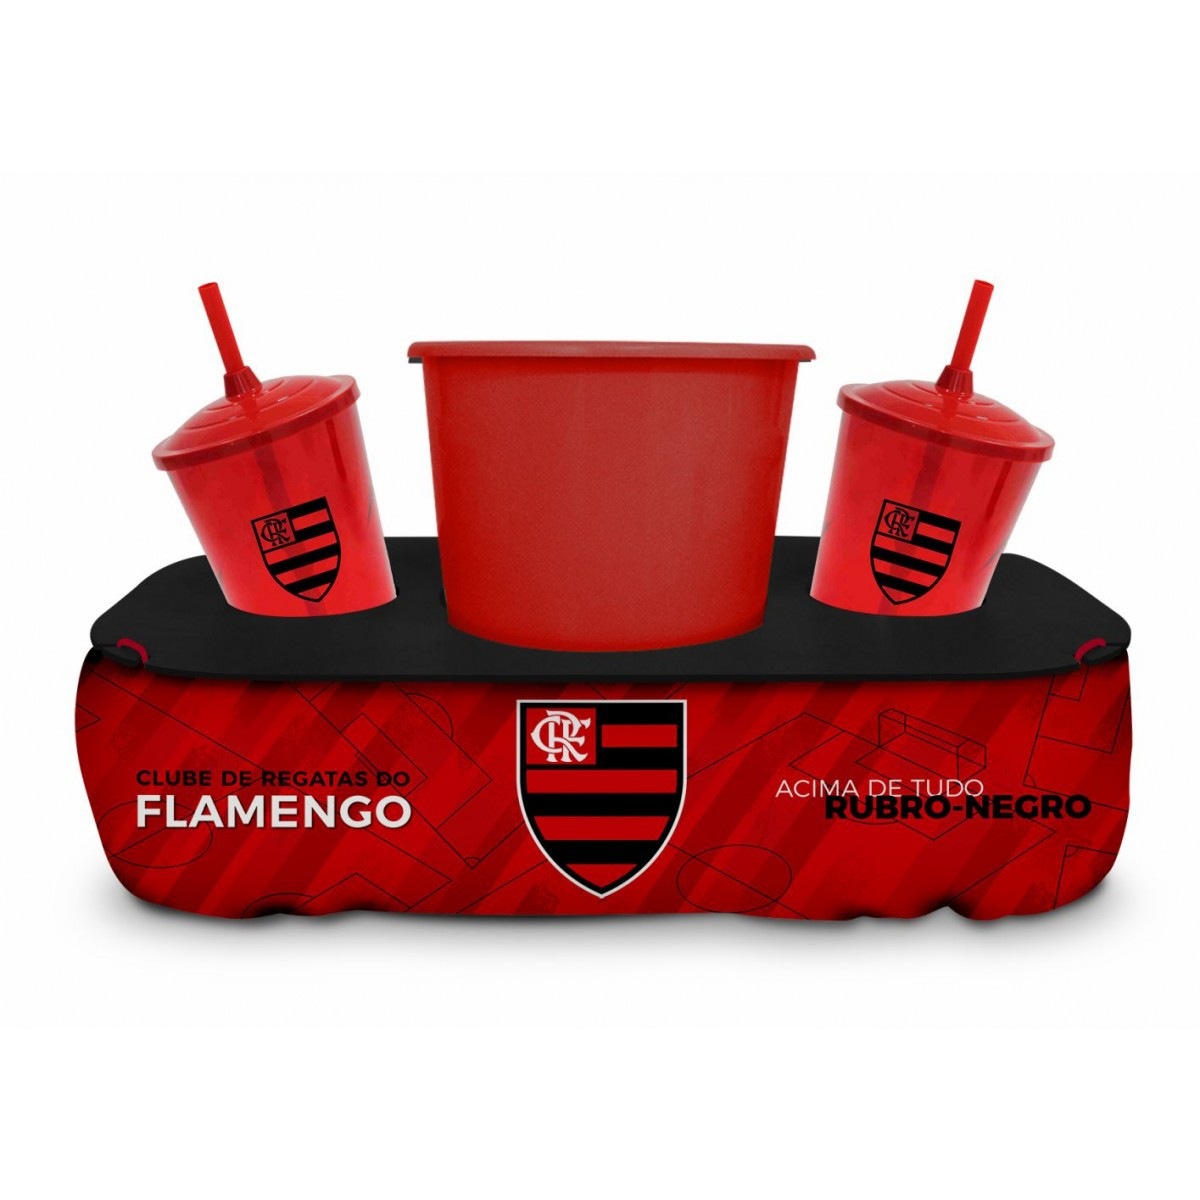 Almofada Porta Pipoca Copos Flamengo Oficial Presente Brasfoot